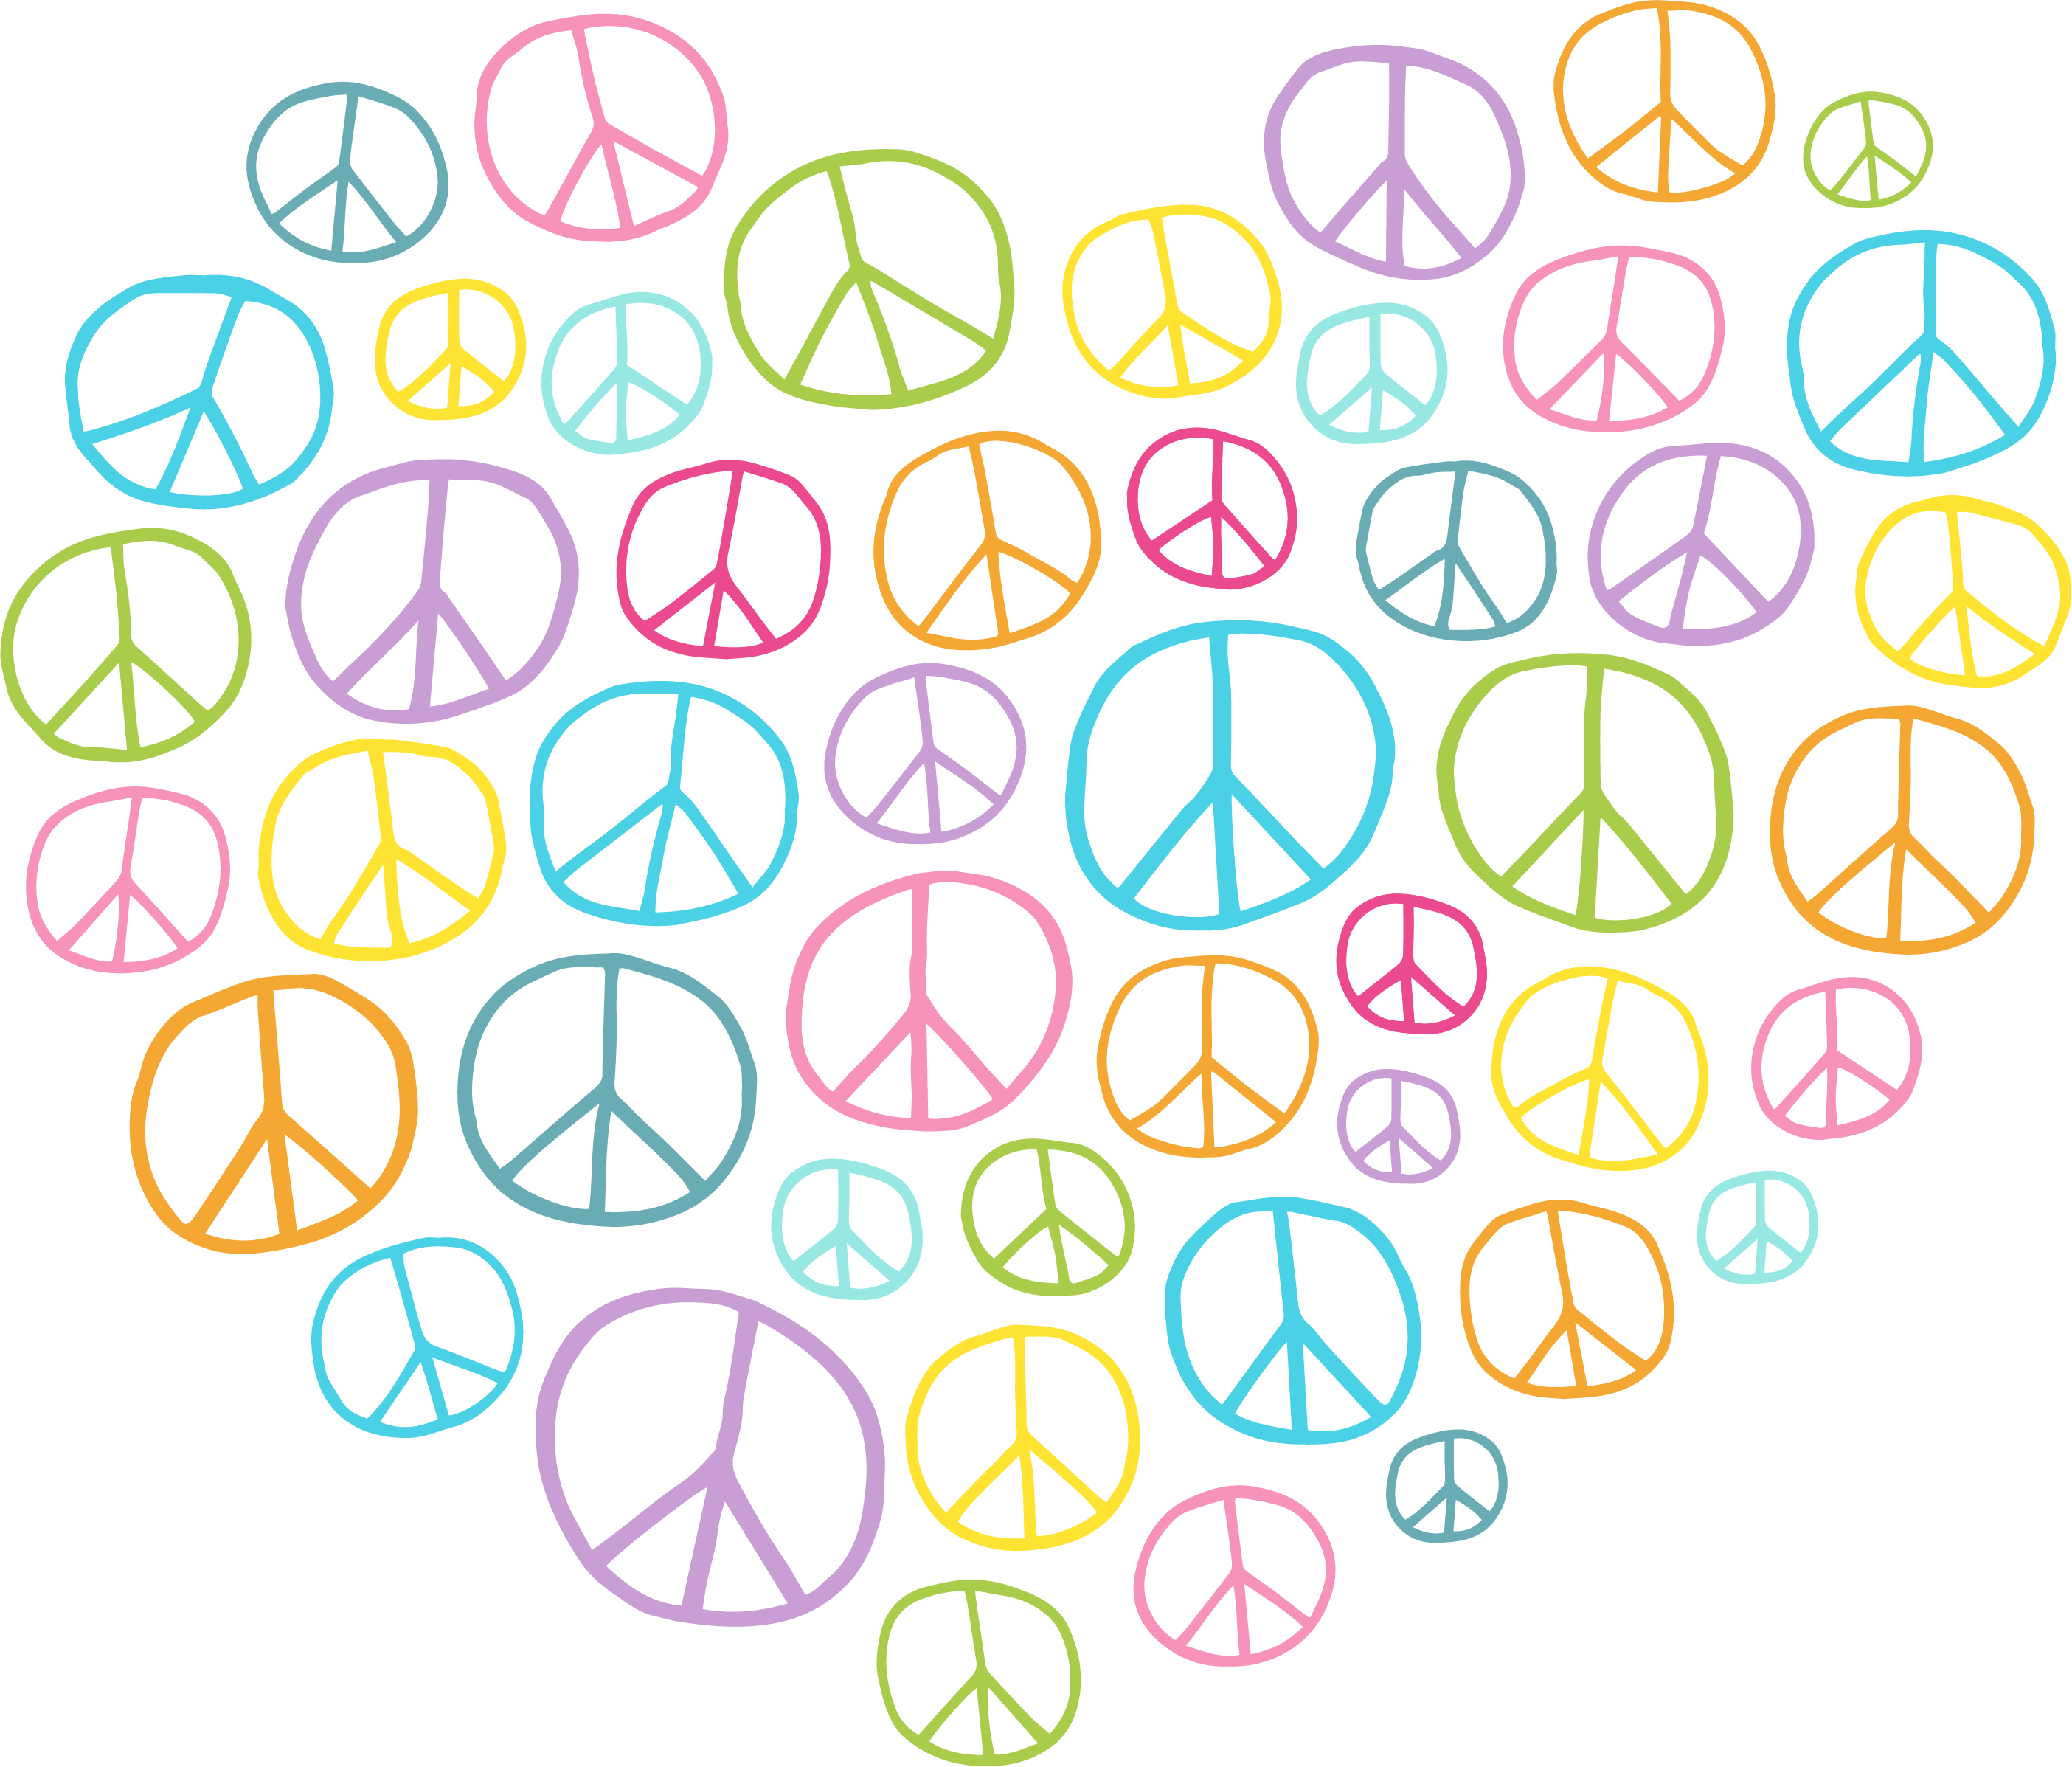 Peace clipart peace mind. Symbol png transparent hd